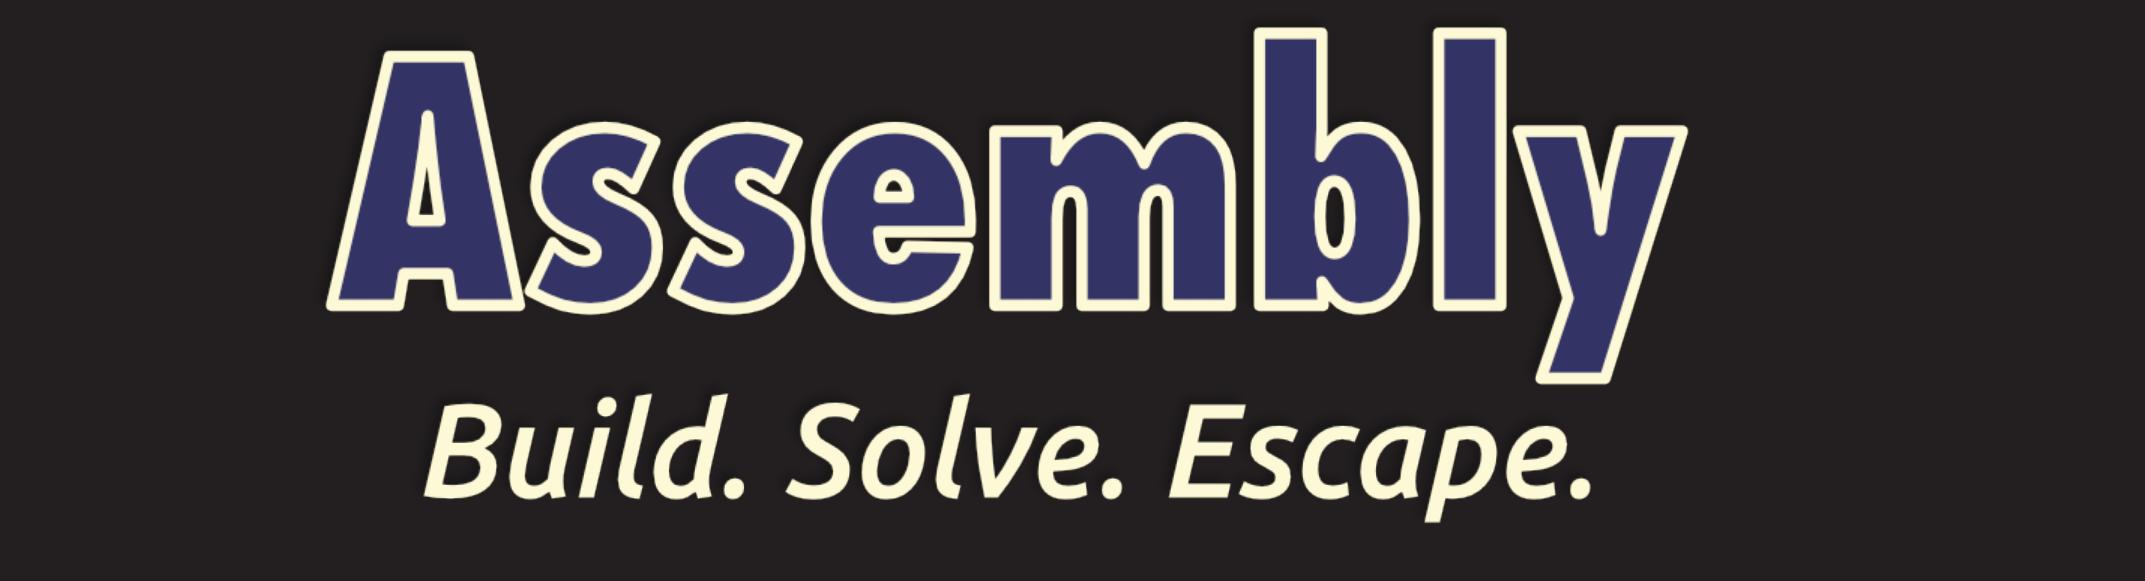 assembly - banner